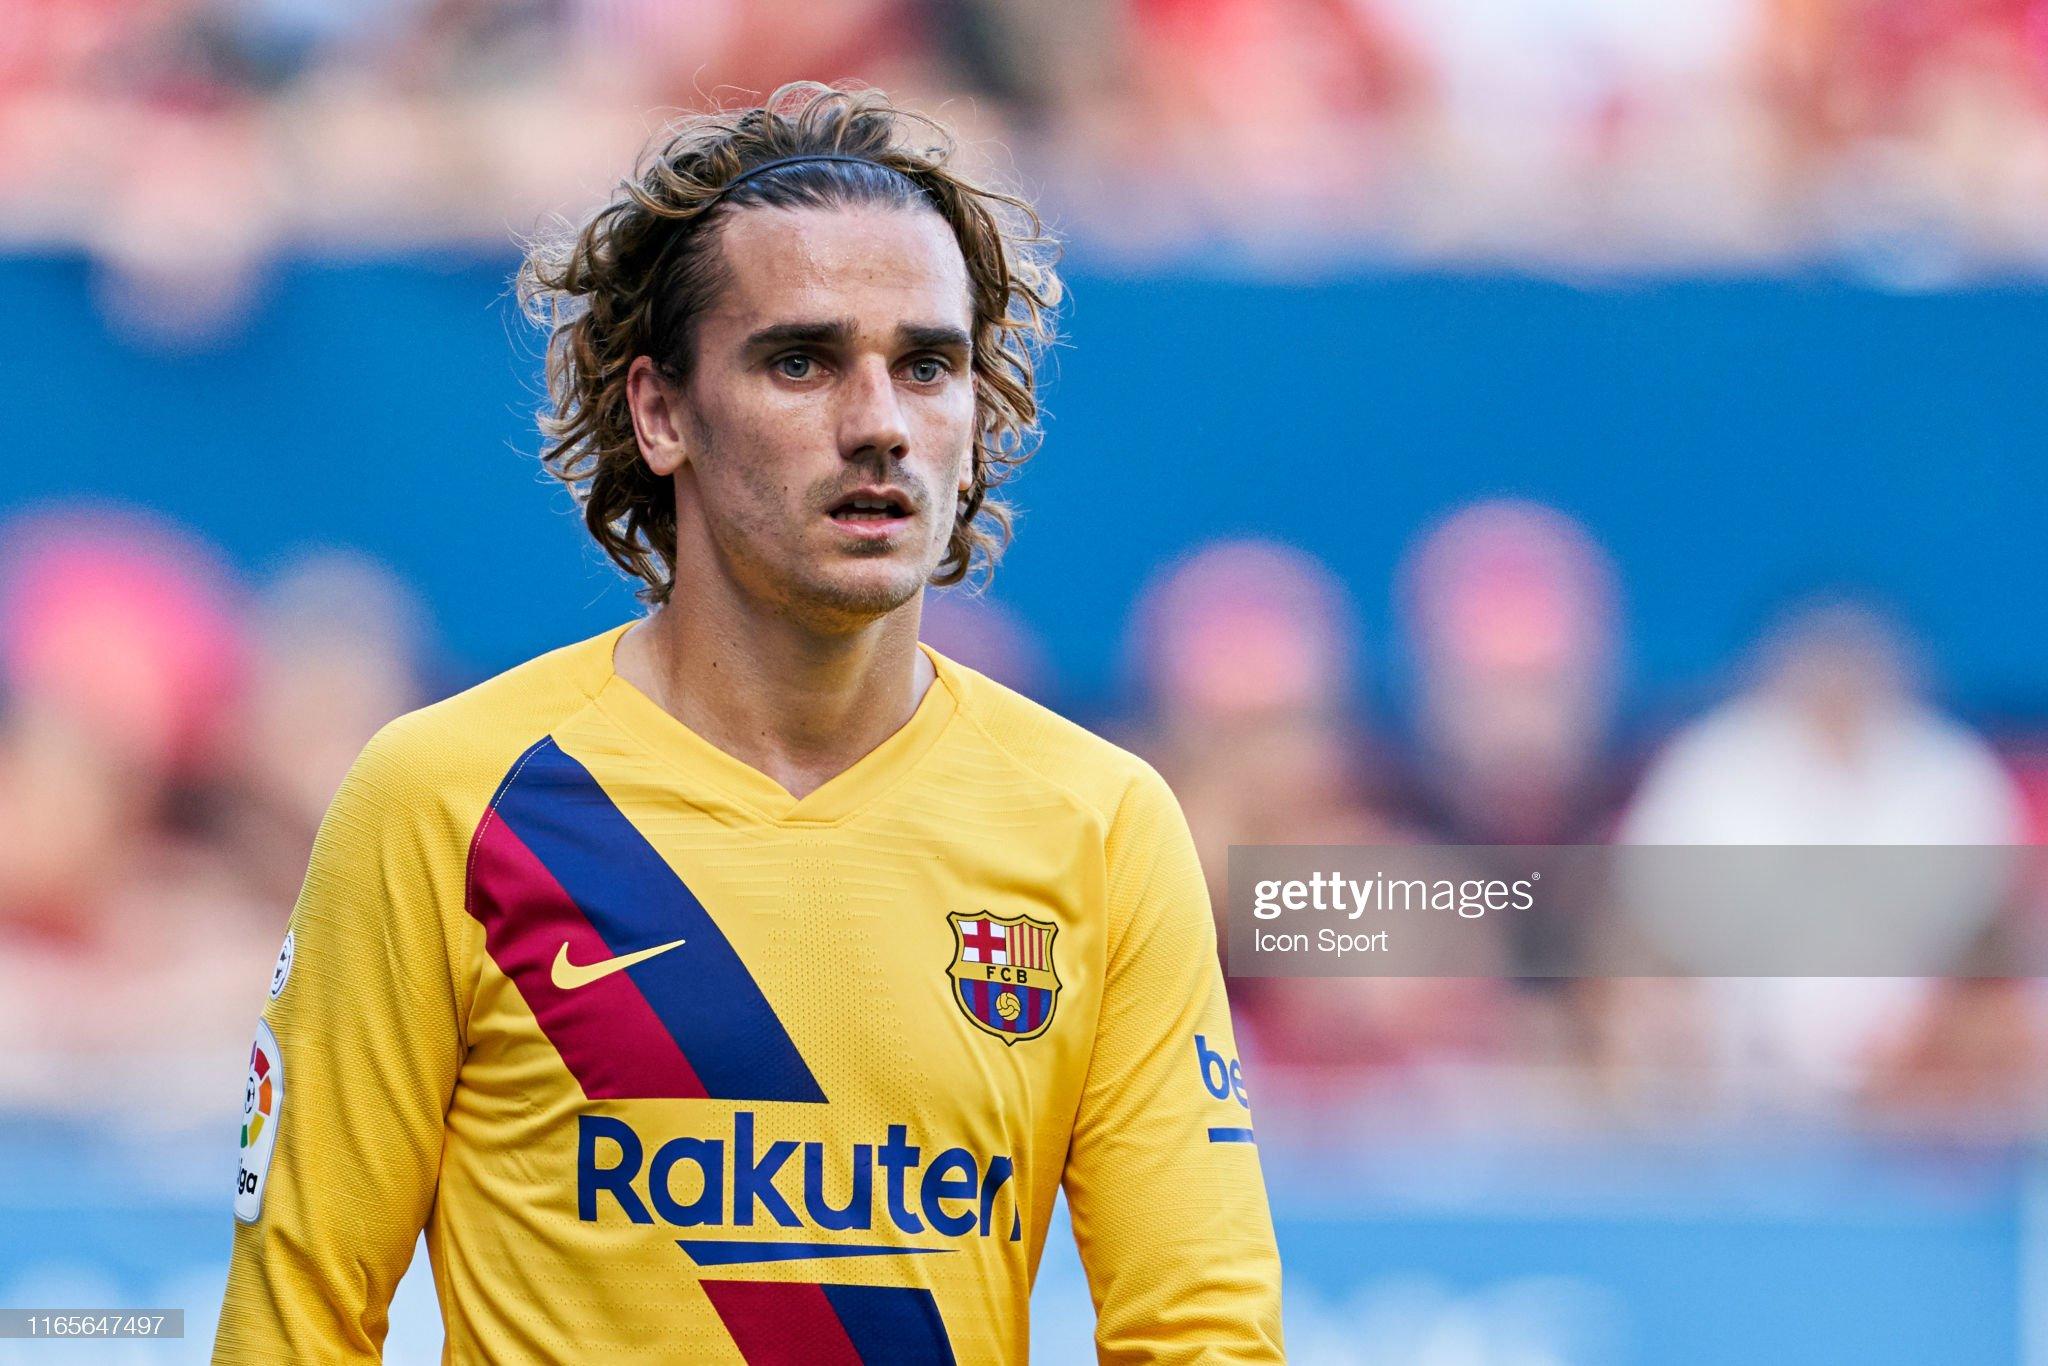 صور مباراة : أوساسونا - برشلونة 2-2 ( 31-08-2019 )  Antoine-griezmann-of-fc-barcelona-during-the-liga-match-between-and-picture-id1165647497?s=2048x2048